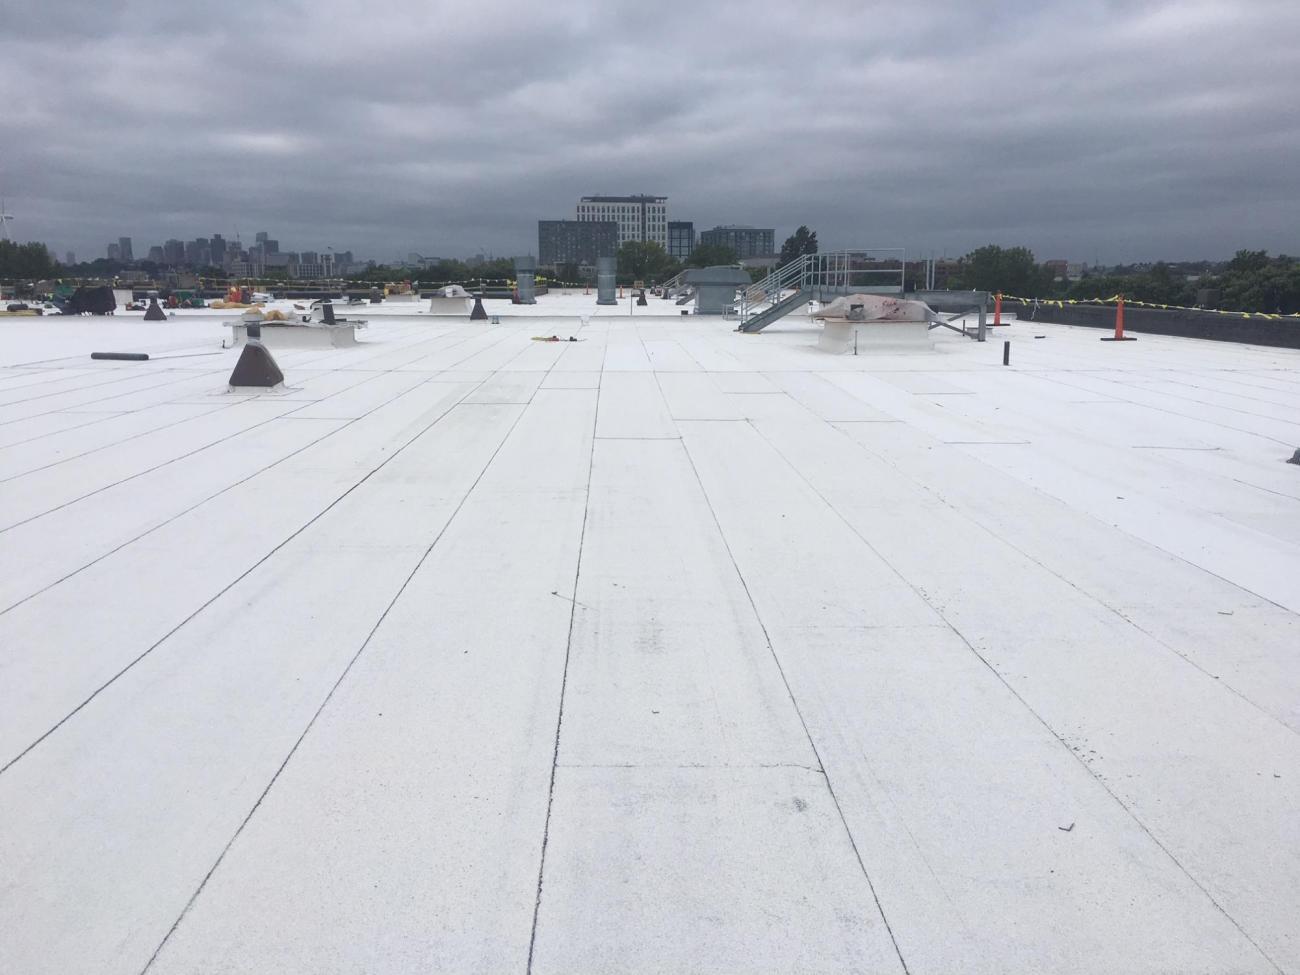 Wellington Maintenance Facility: Roof installation (September 2018)